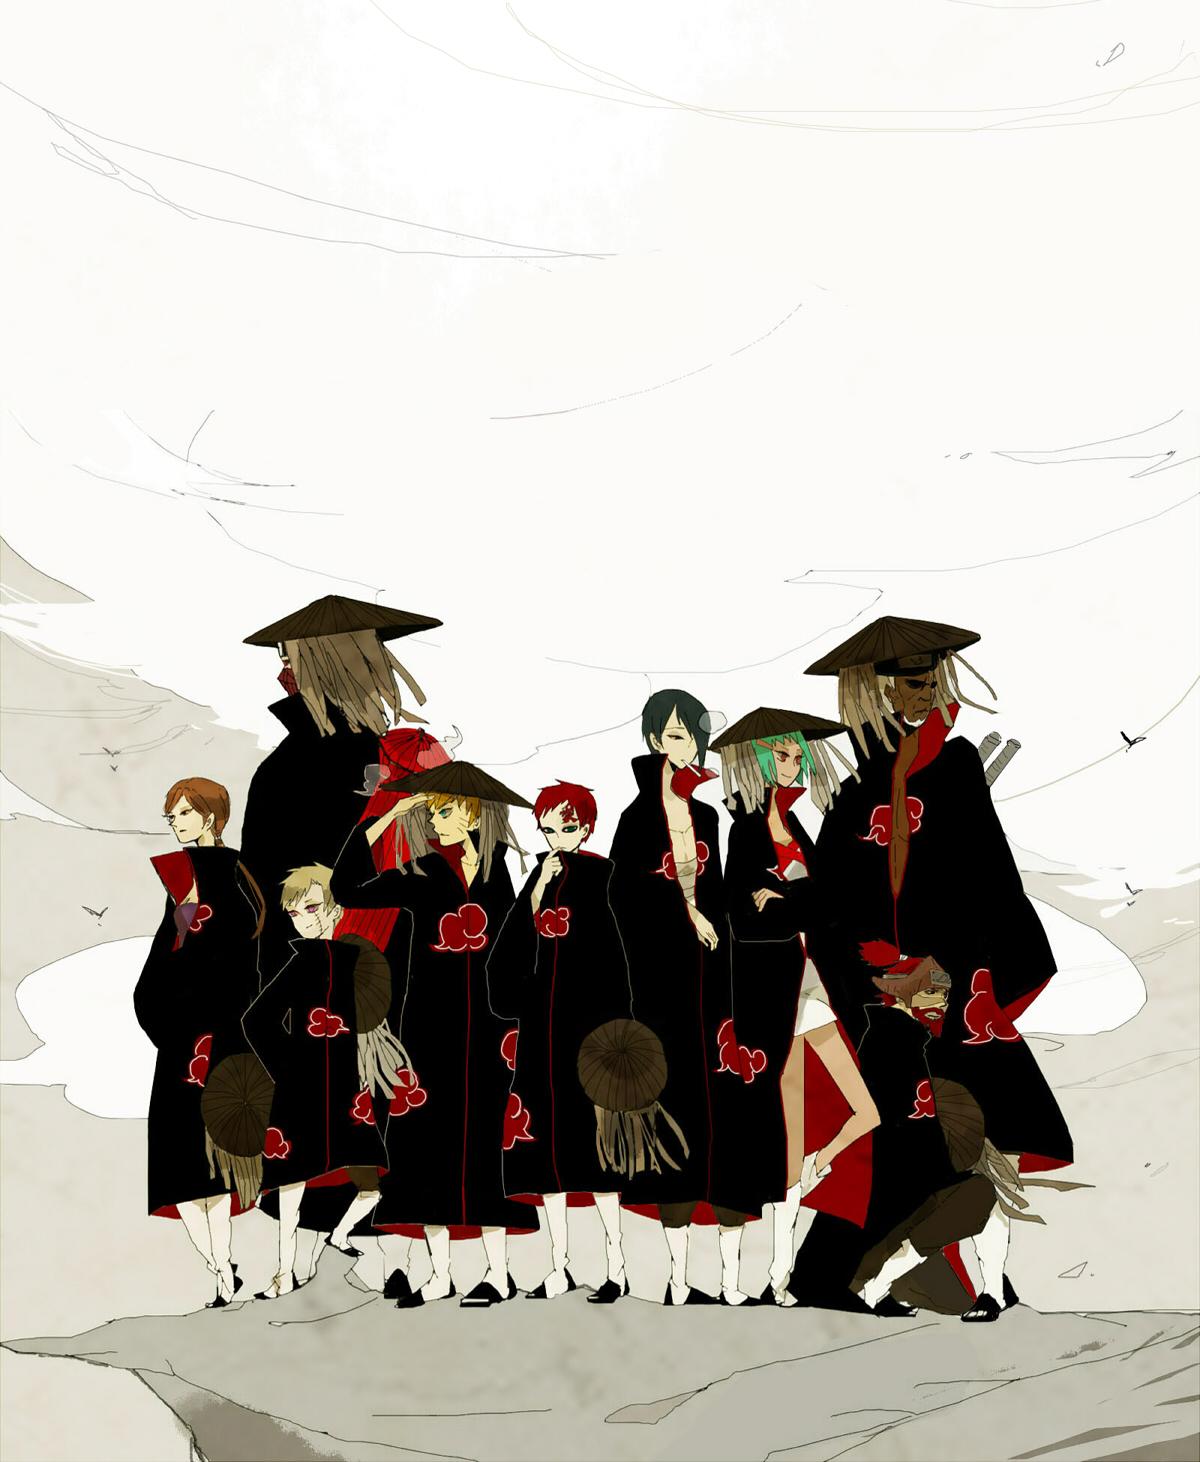 Yagura - NARUTO - Zerochan Anime Image Board